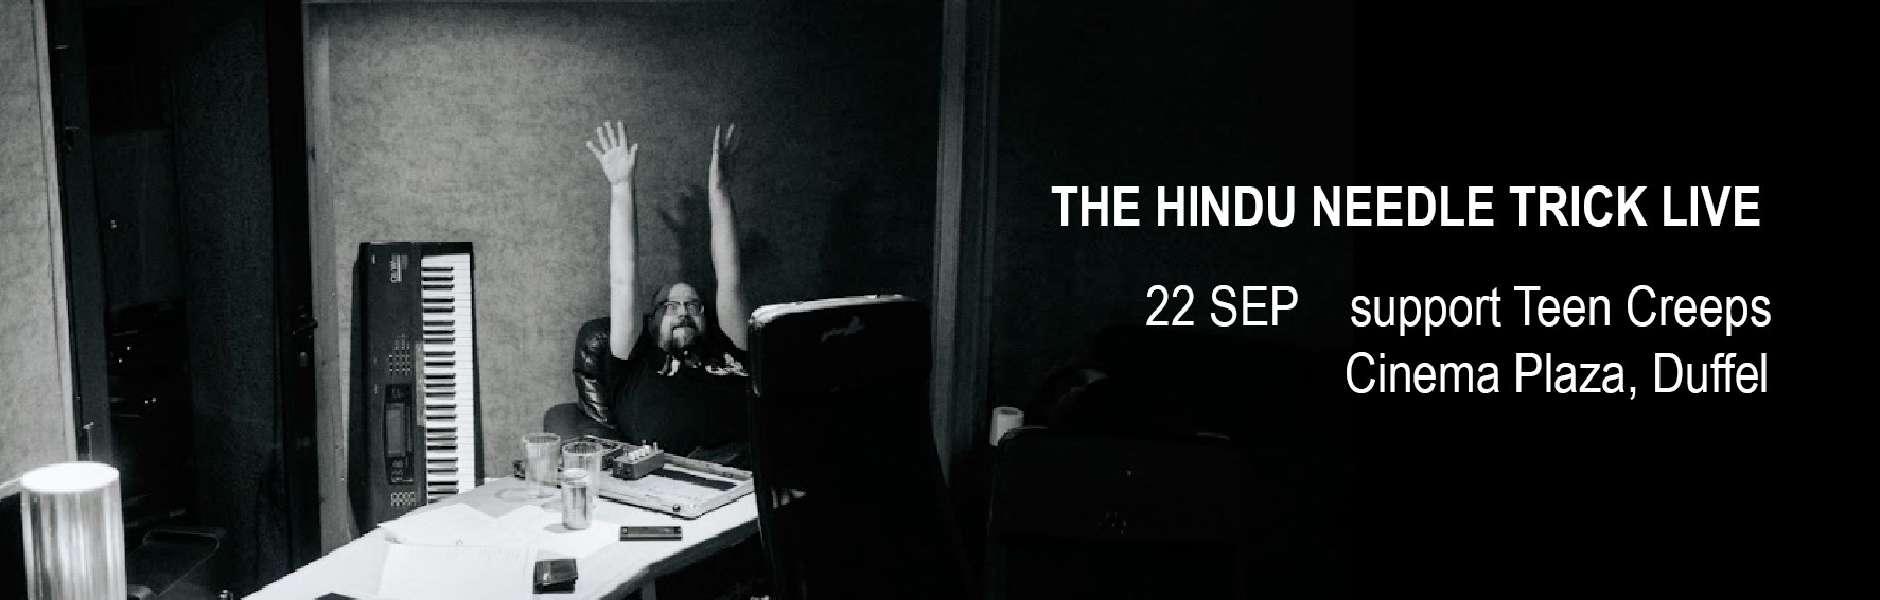 The Hindu Needle Trick